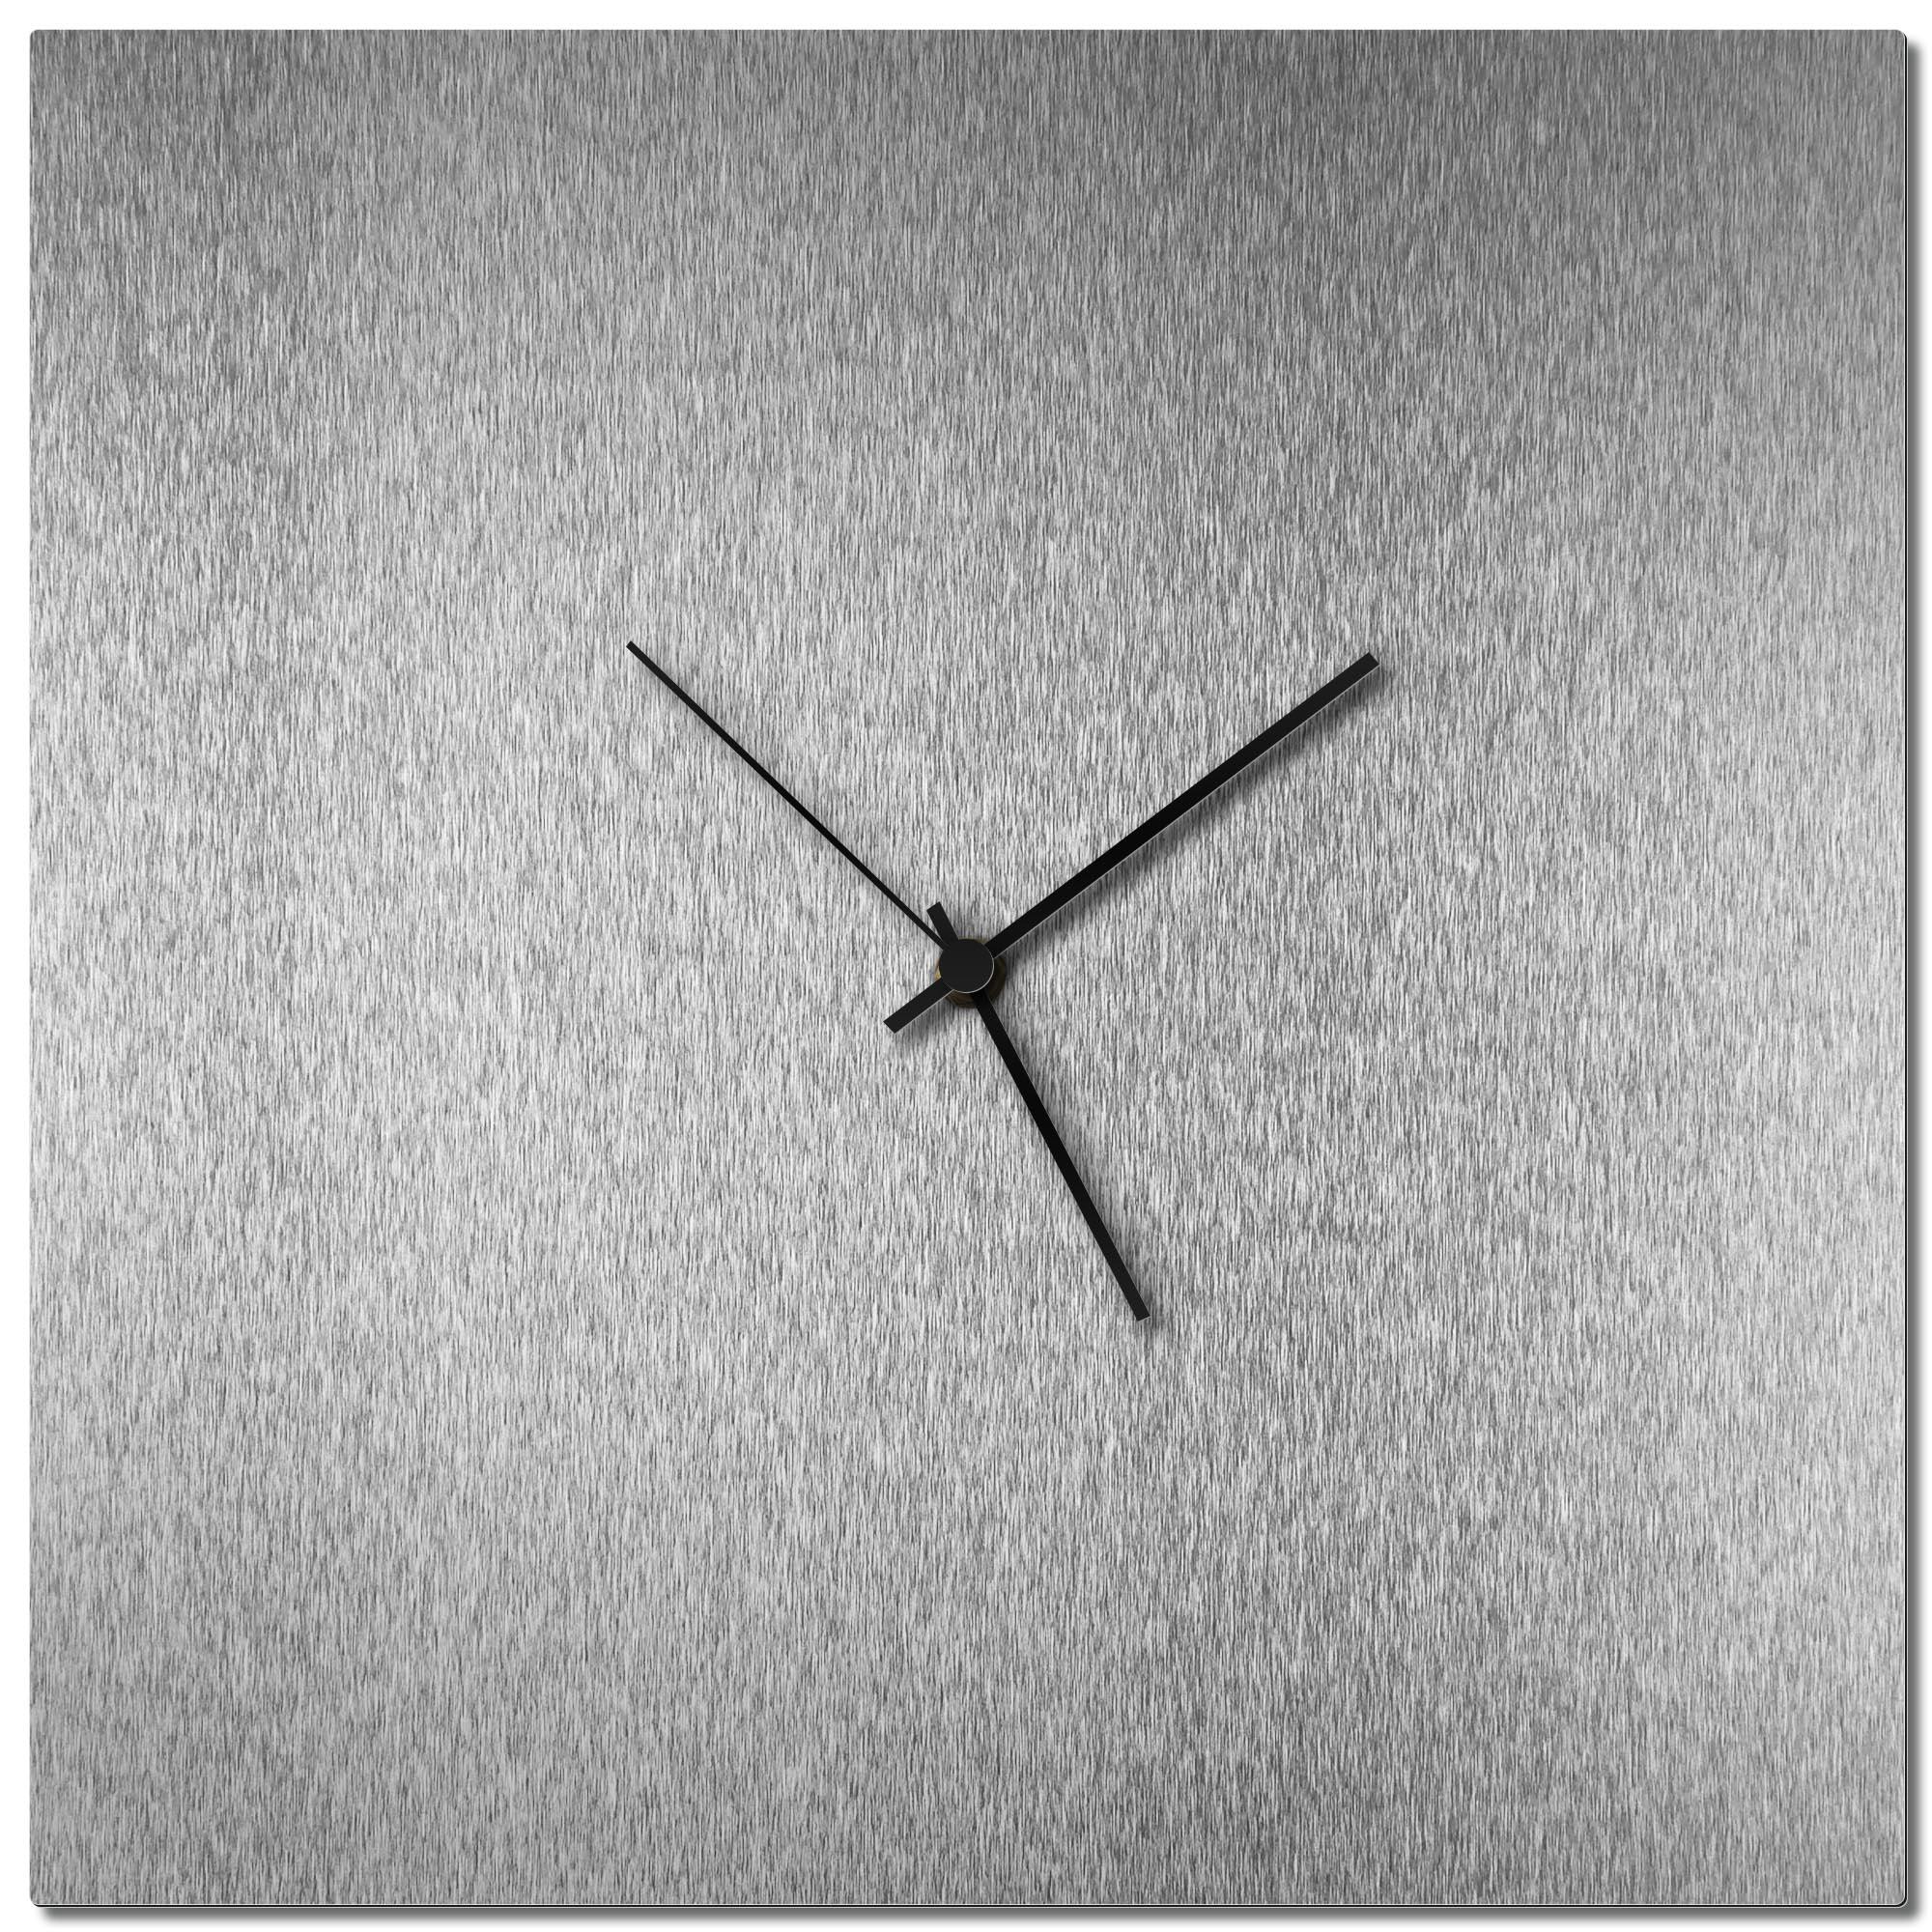 Adam Schwoeppe 'Silversmith Square Clock Large Black' Midcentury Modern Style Wall Clock